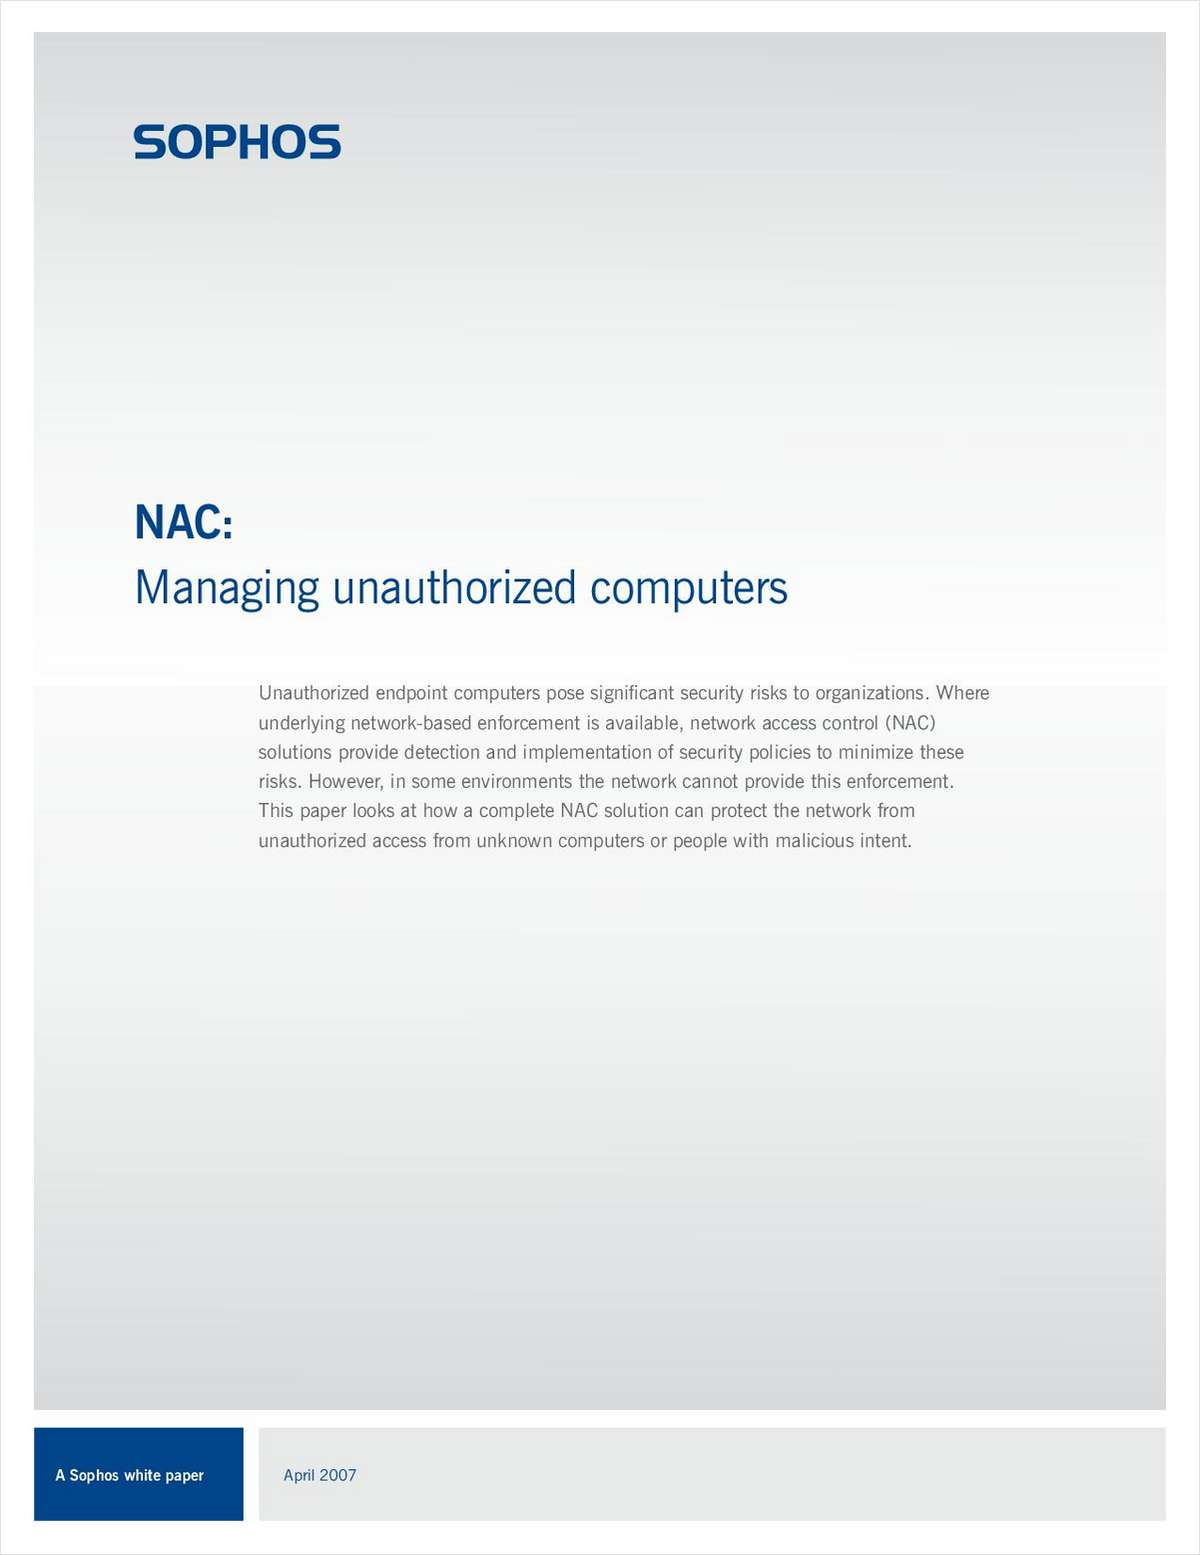 NAC: Managing Unauthorized Computers